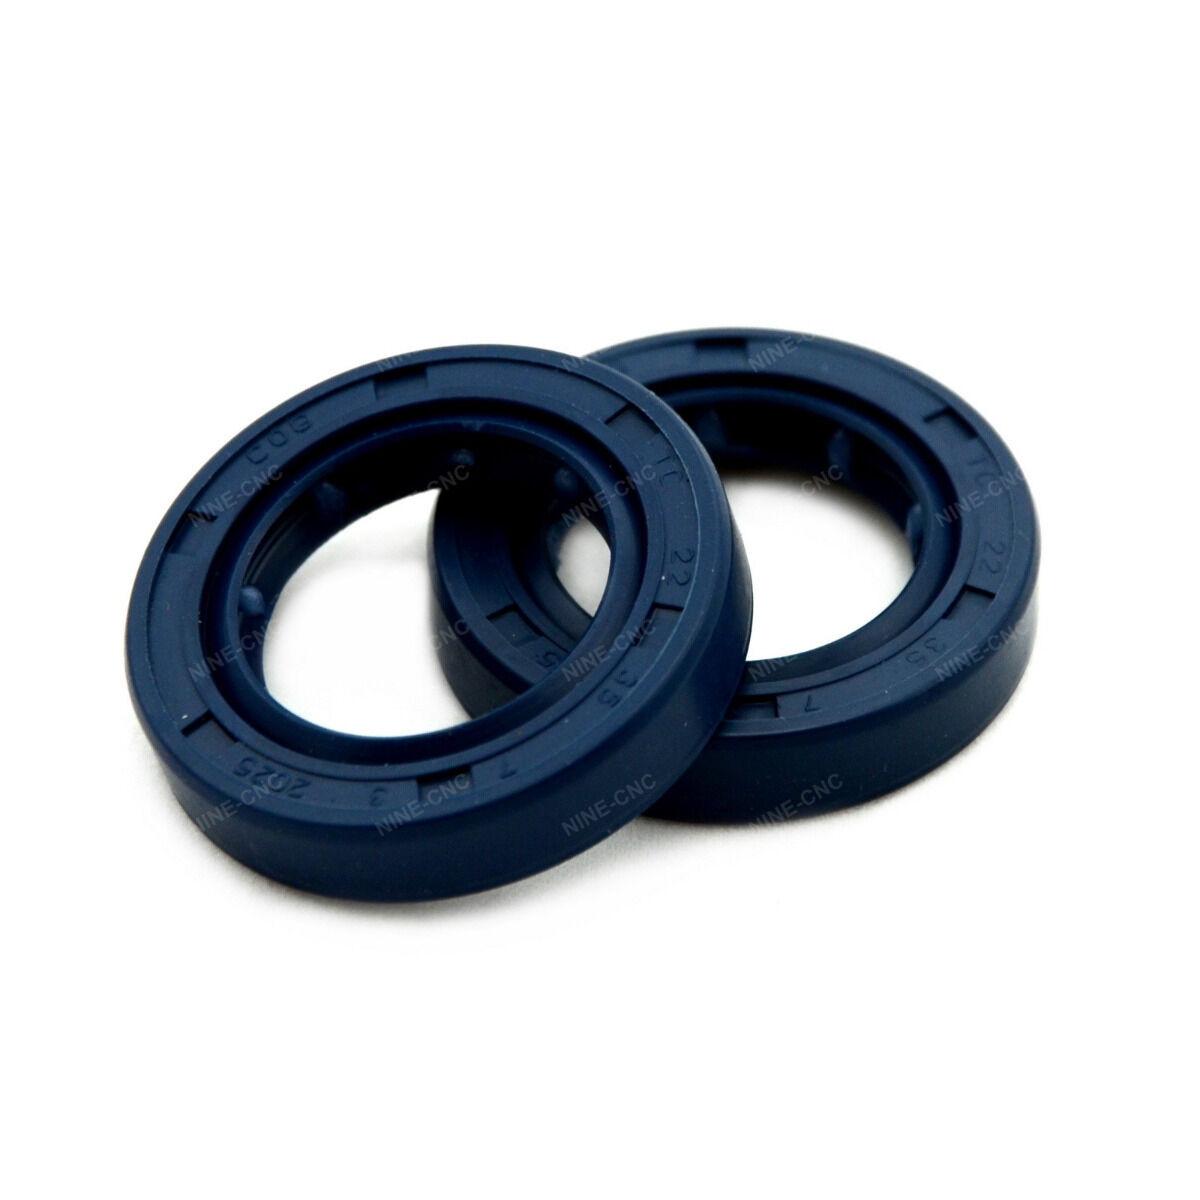 Shaft oil seal tc rubber double lip mm